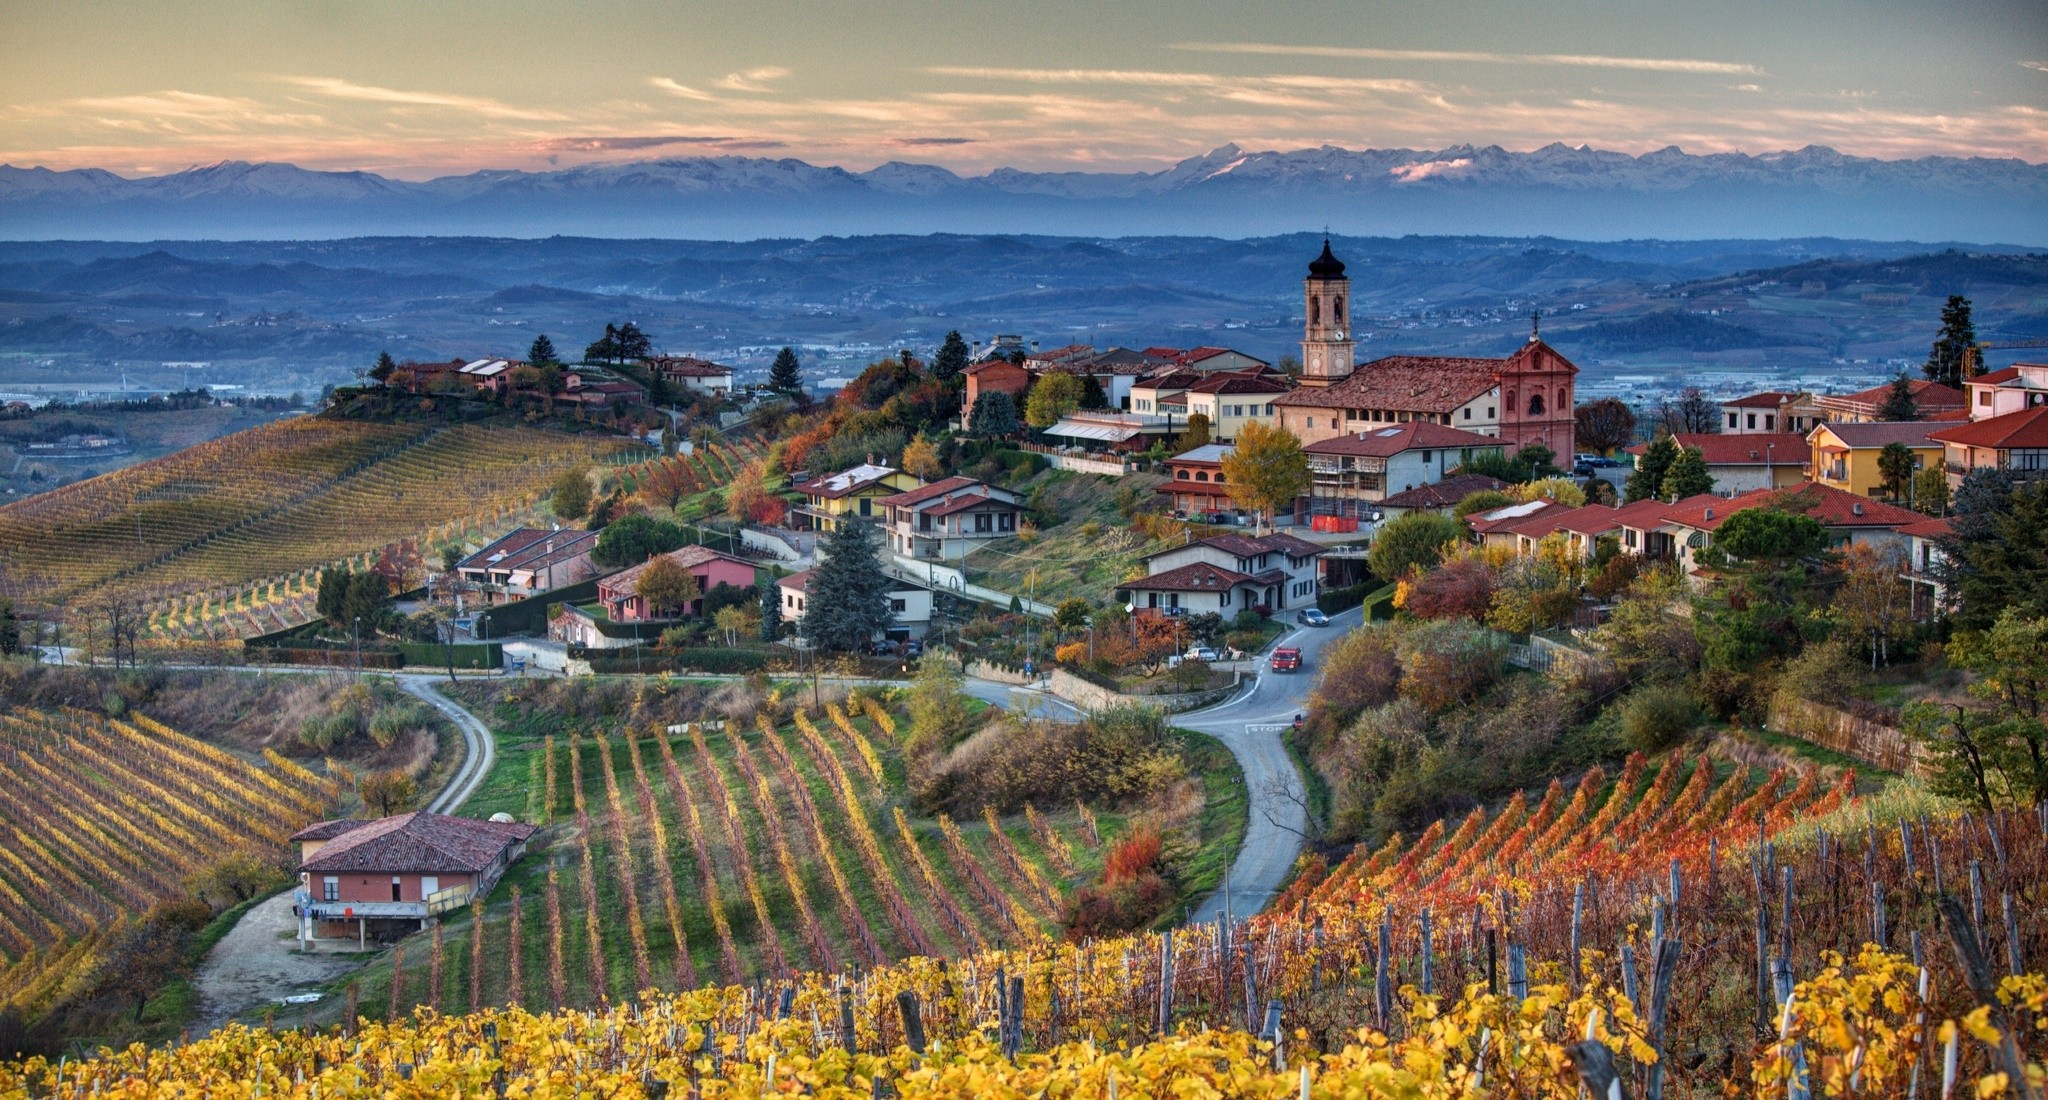 Italia Italy Piemonte Treiso landscapes wallpaper 2048x1100